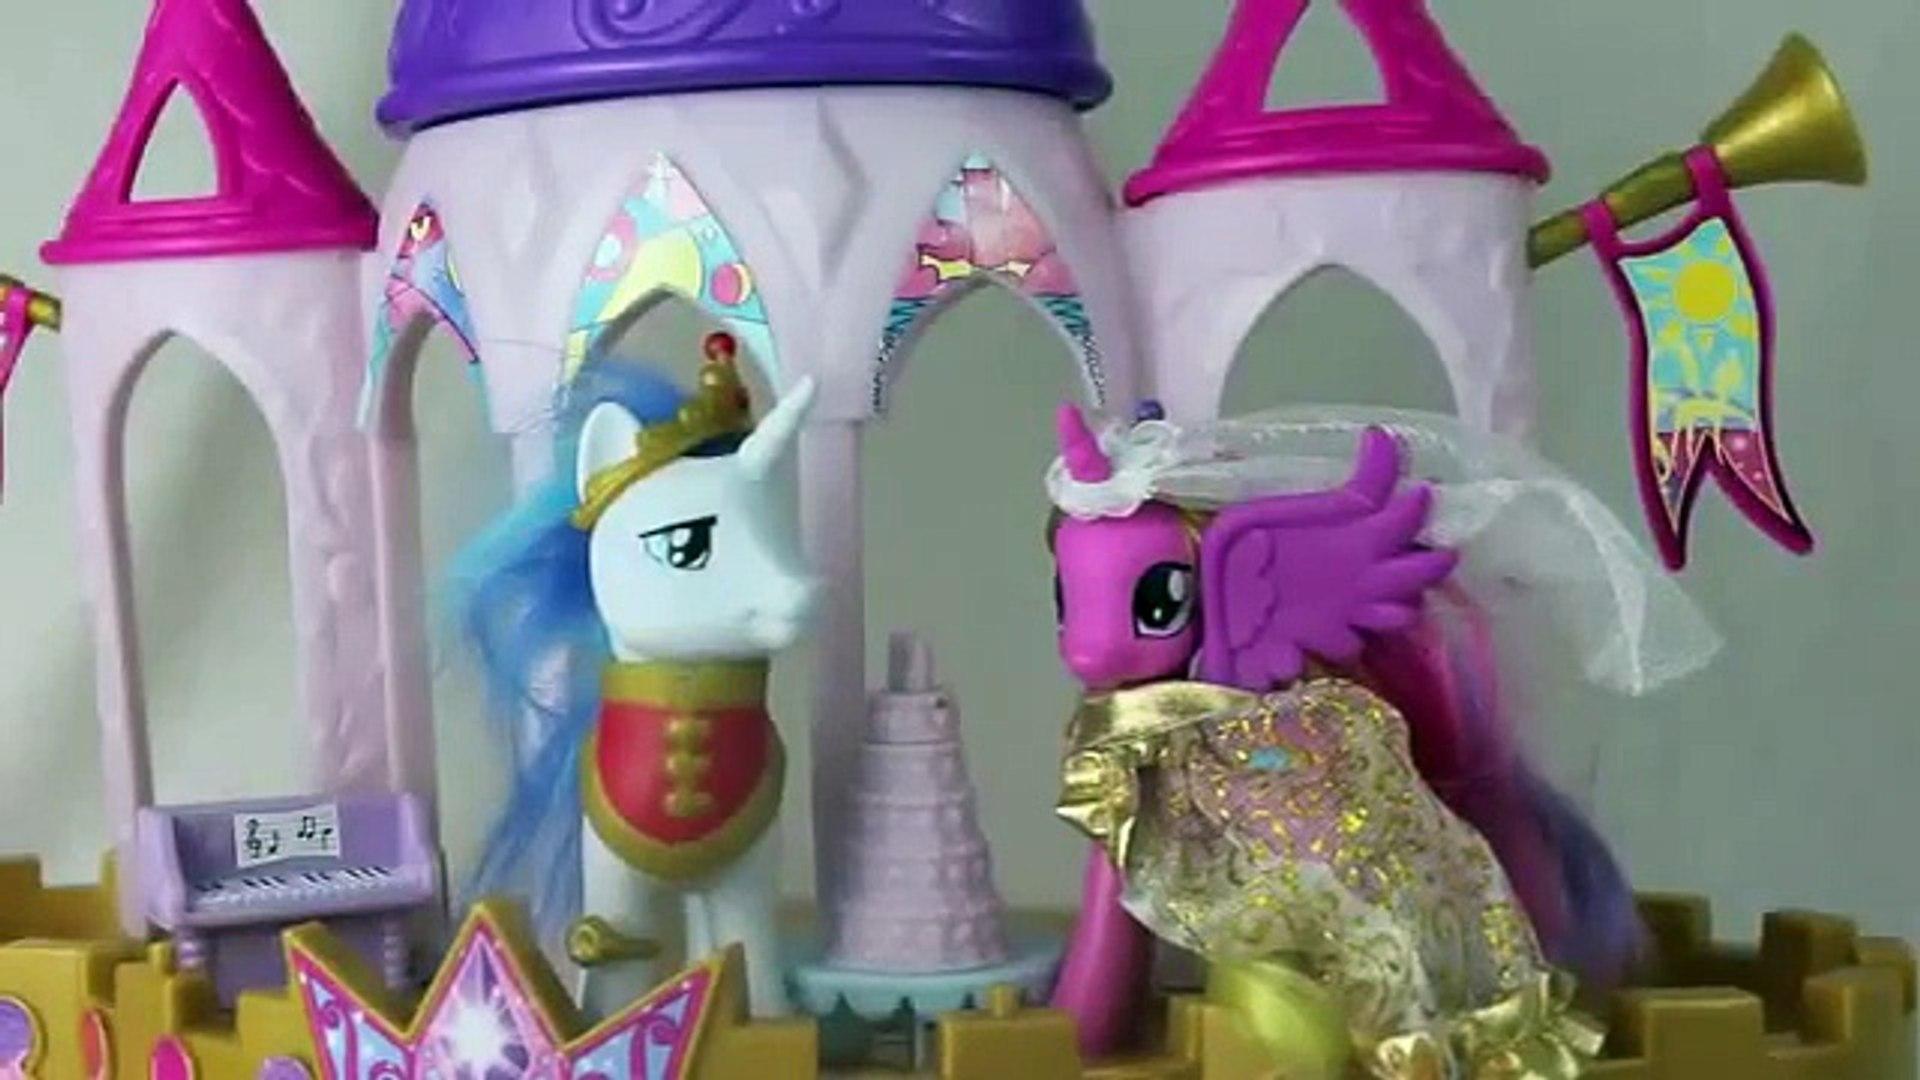 Toy Story Rex and My Little Pony Wedding Crashers with Toy Story 3 Buzz Lightyear MLP DisneyCarToys